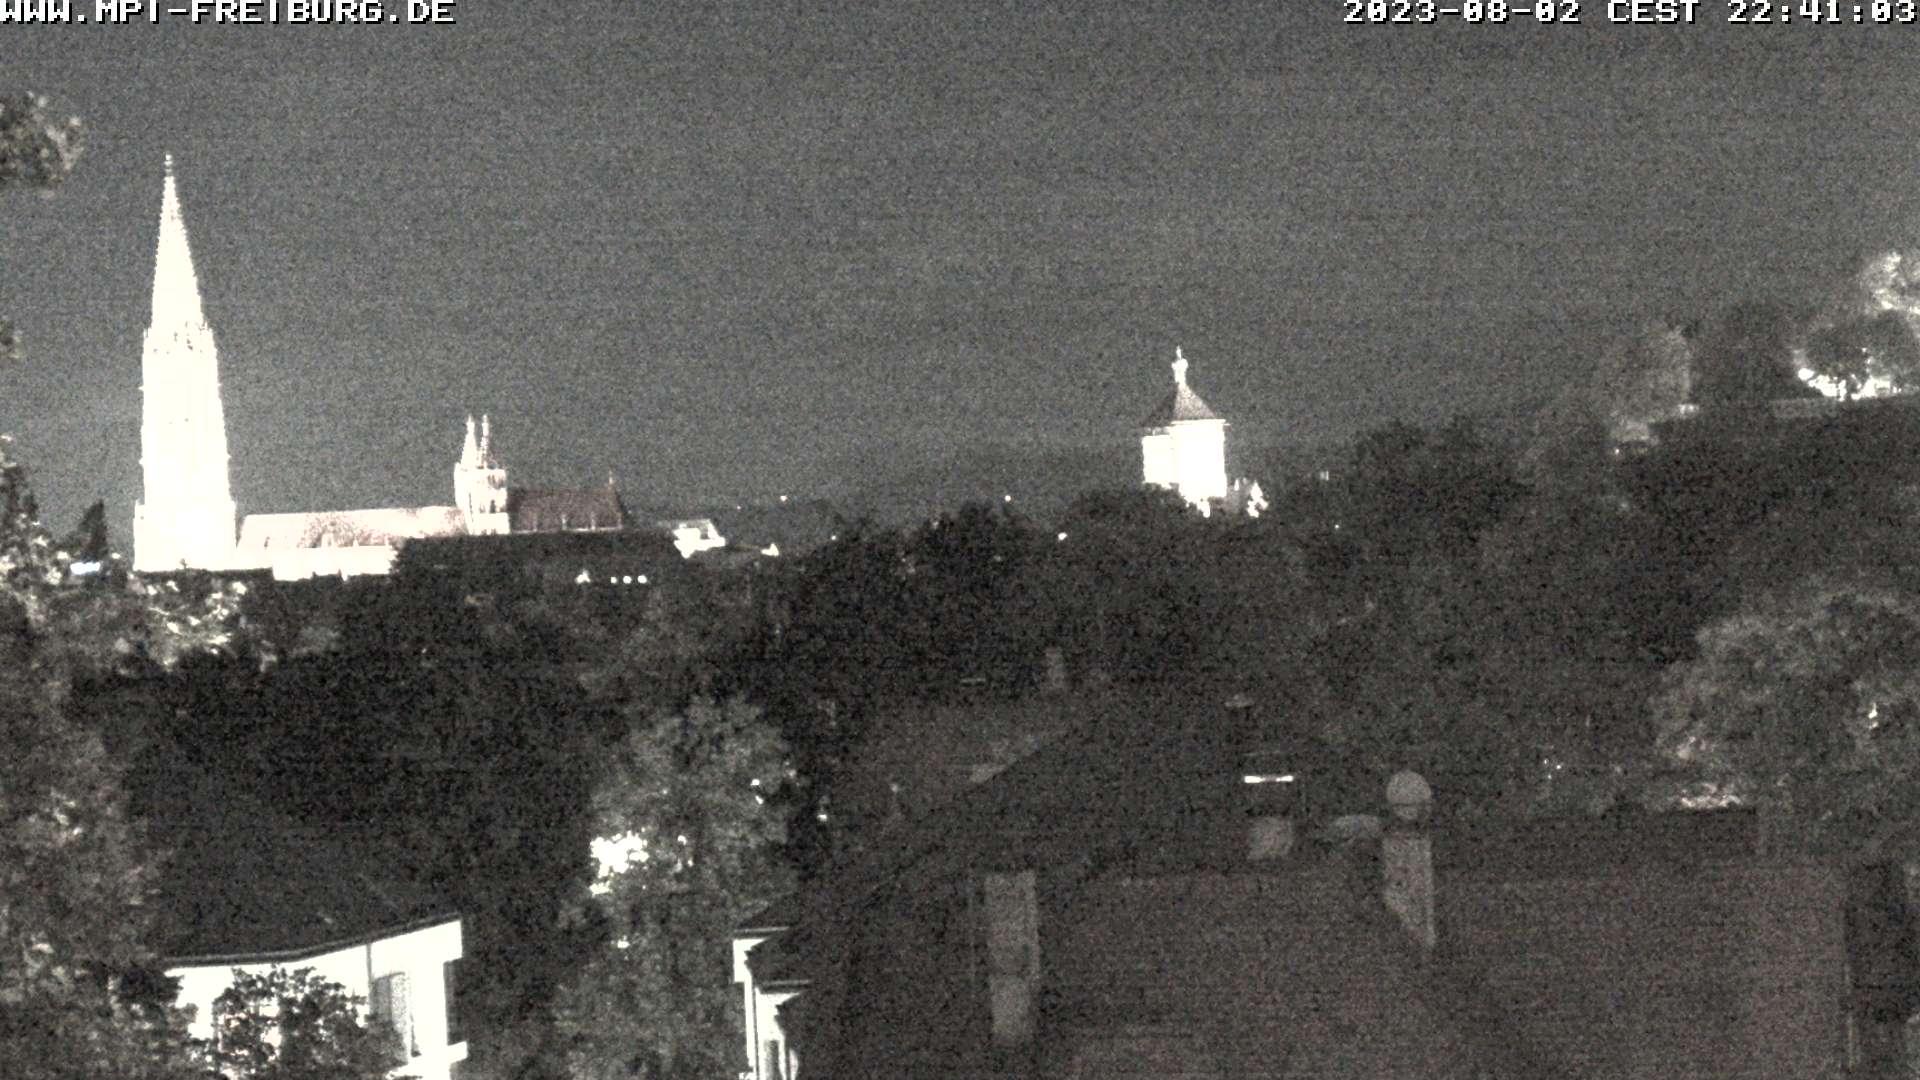 Freiburg i. B. Sternwaldeck